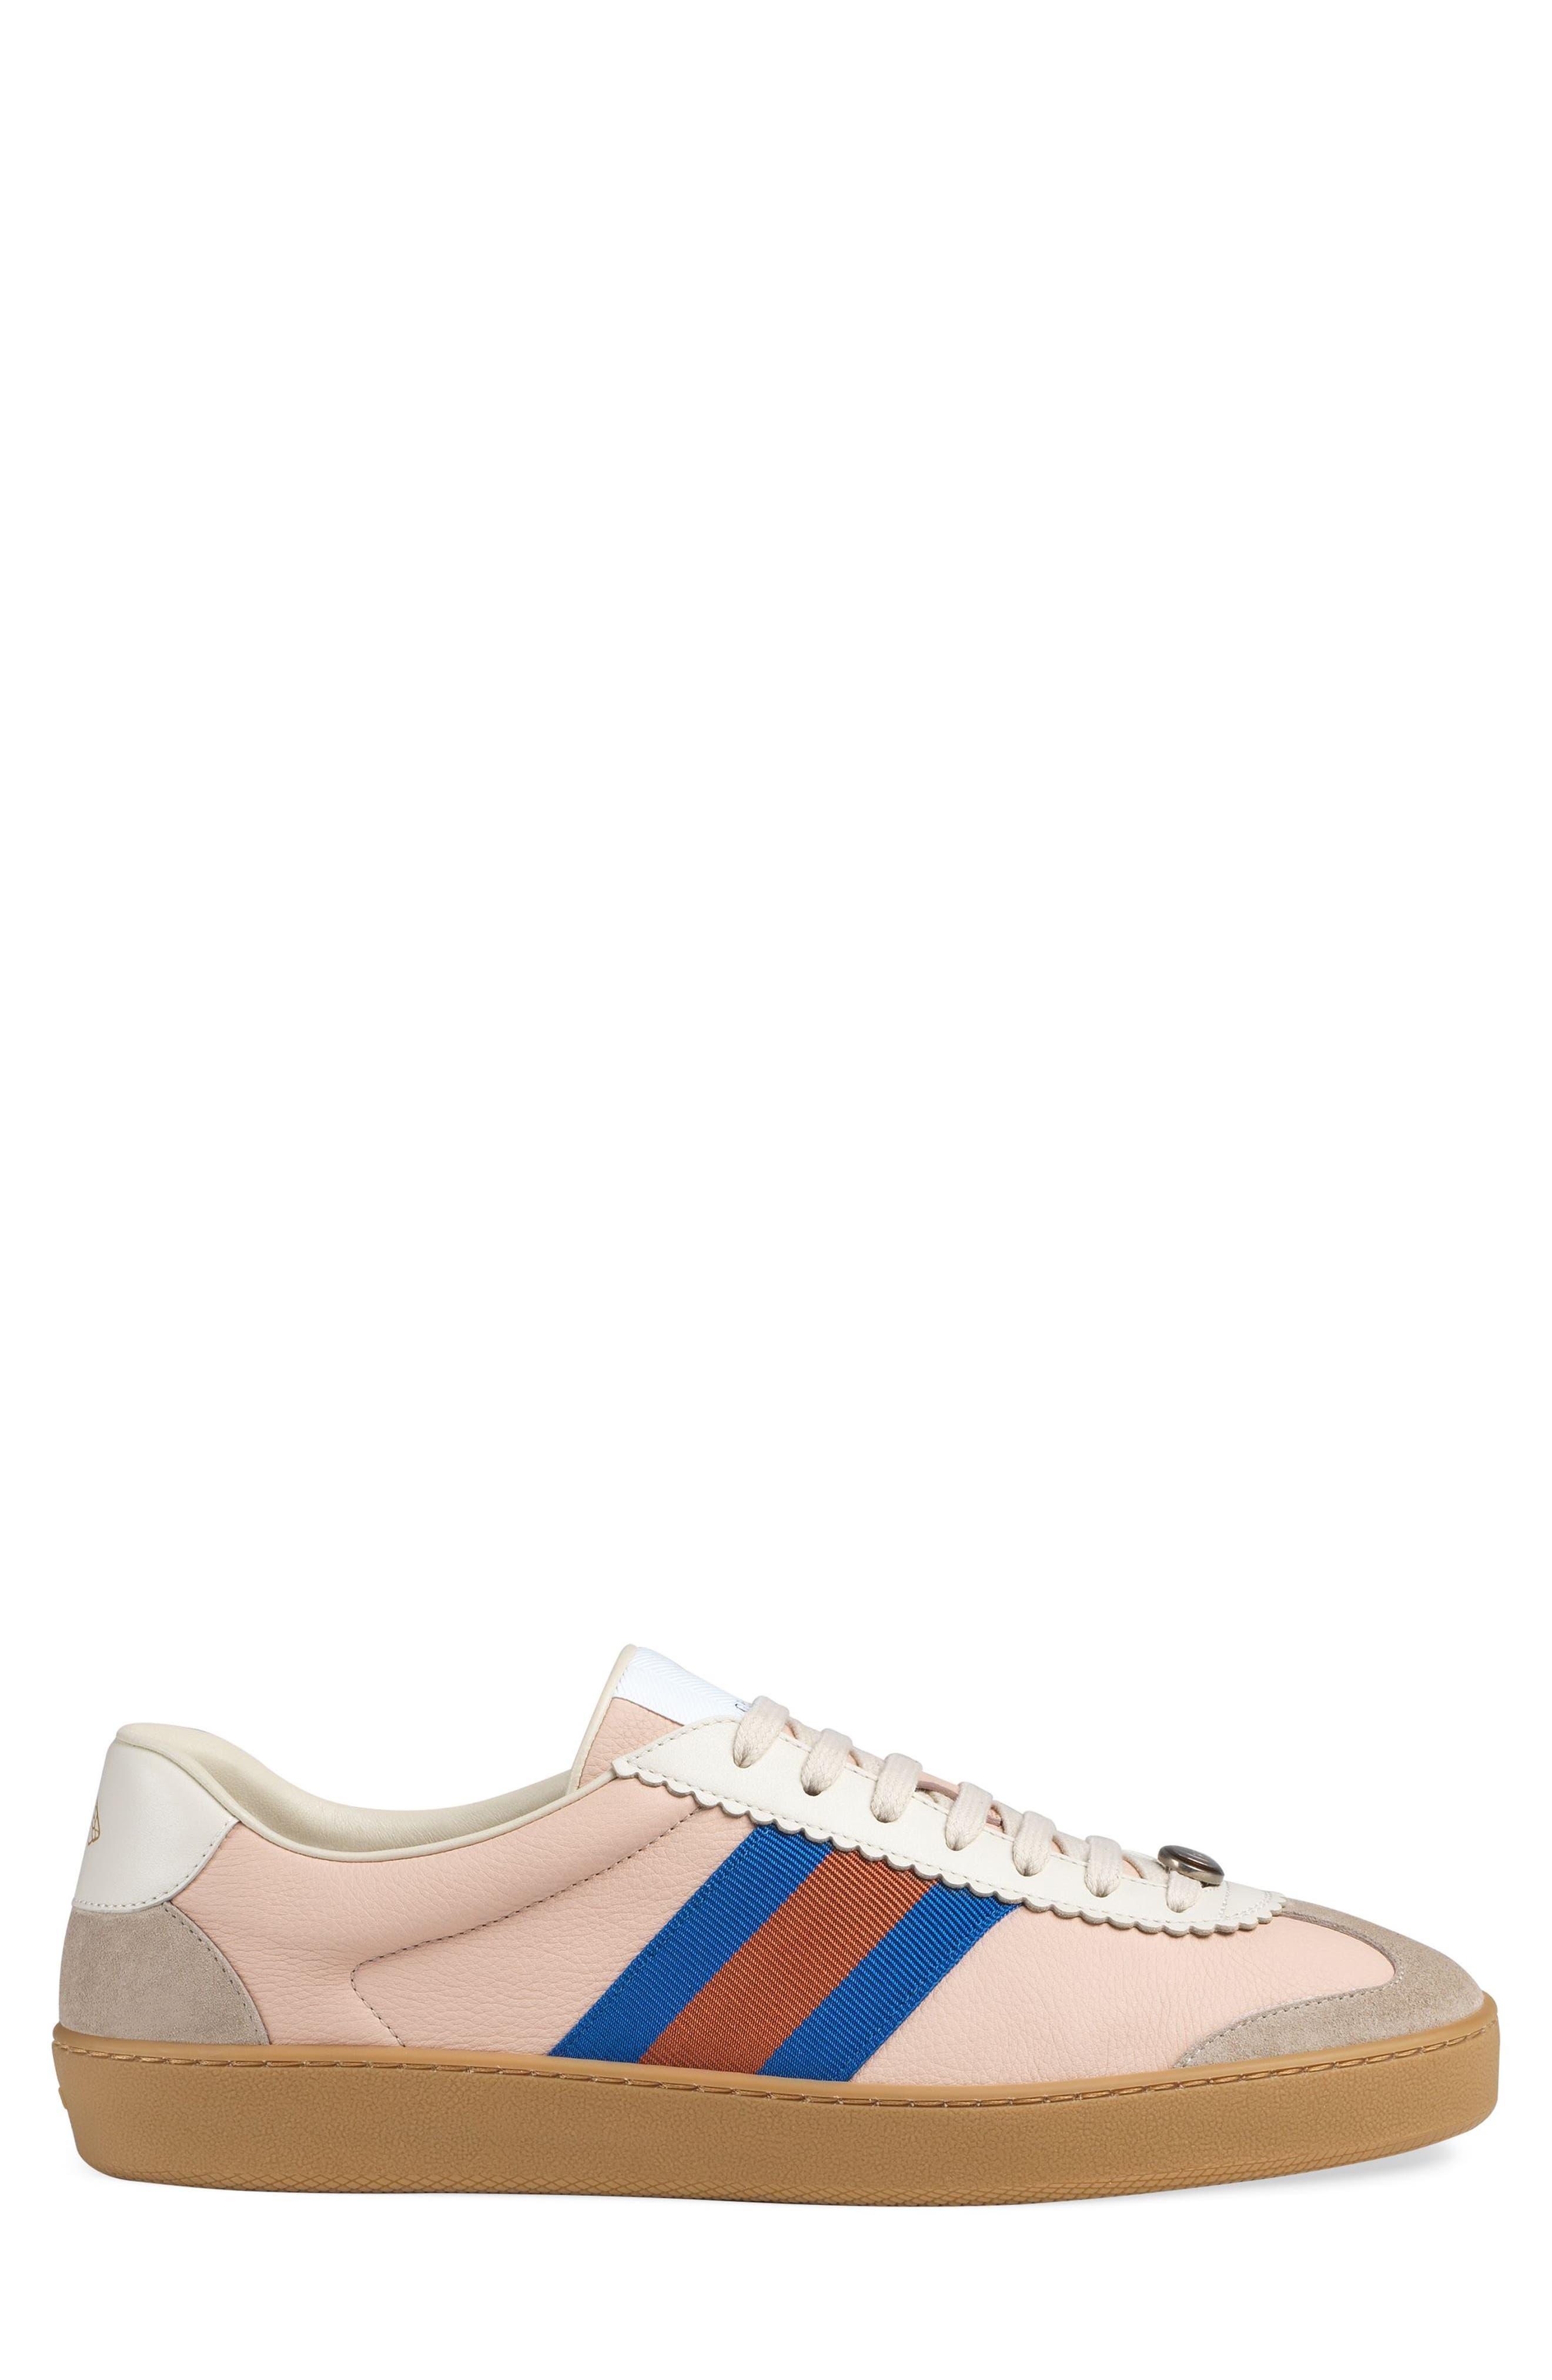 JBP Retro Gum Sole Sneaker,                             Alternate thumbnail 2, color,                             Oatmeal/ White